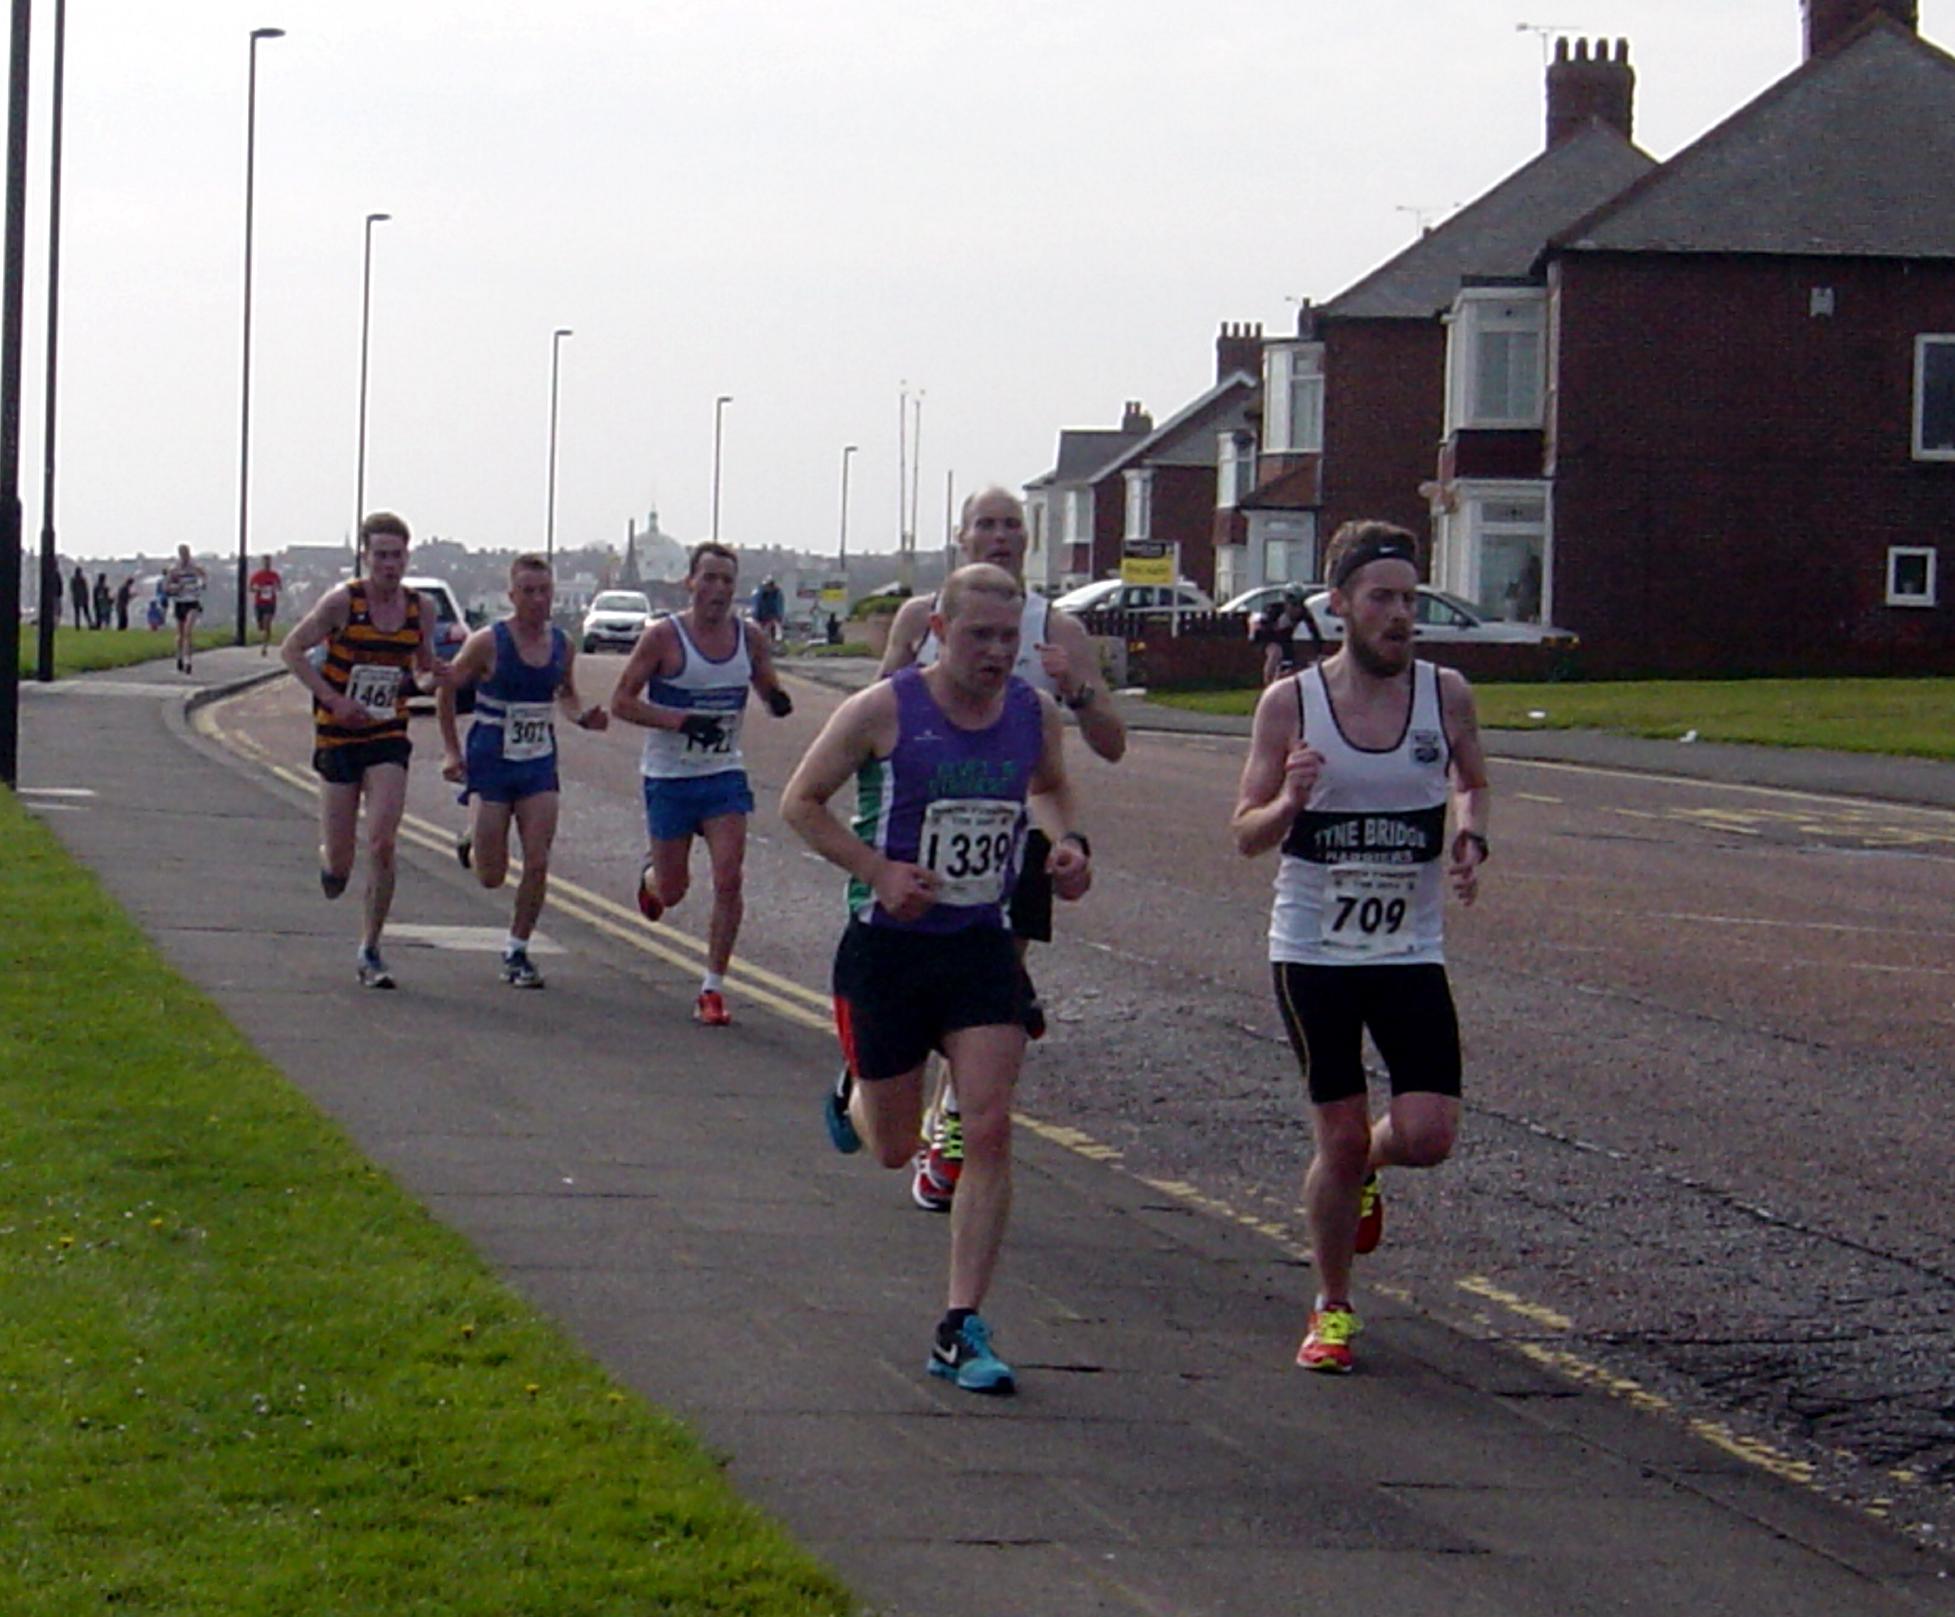 David Johnson & Chris Meek (behind Elvet runner)